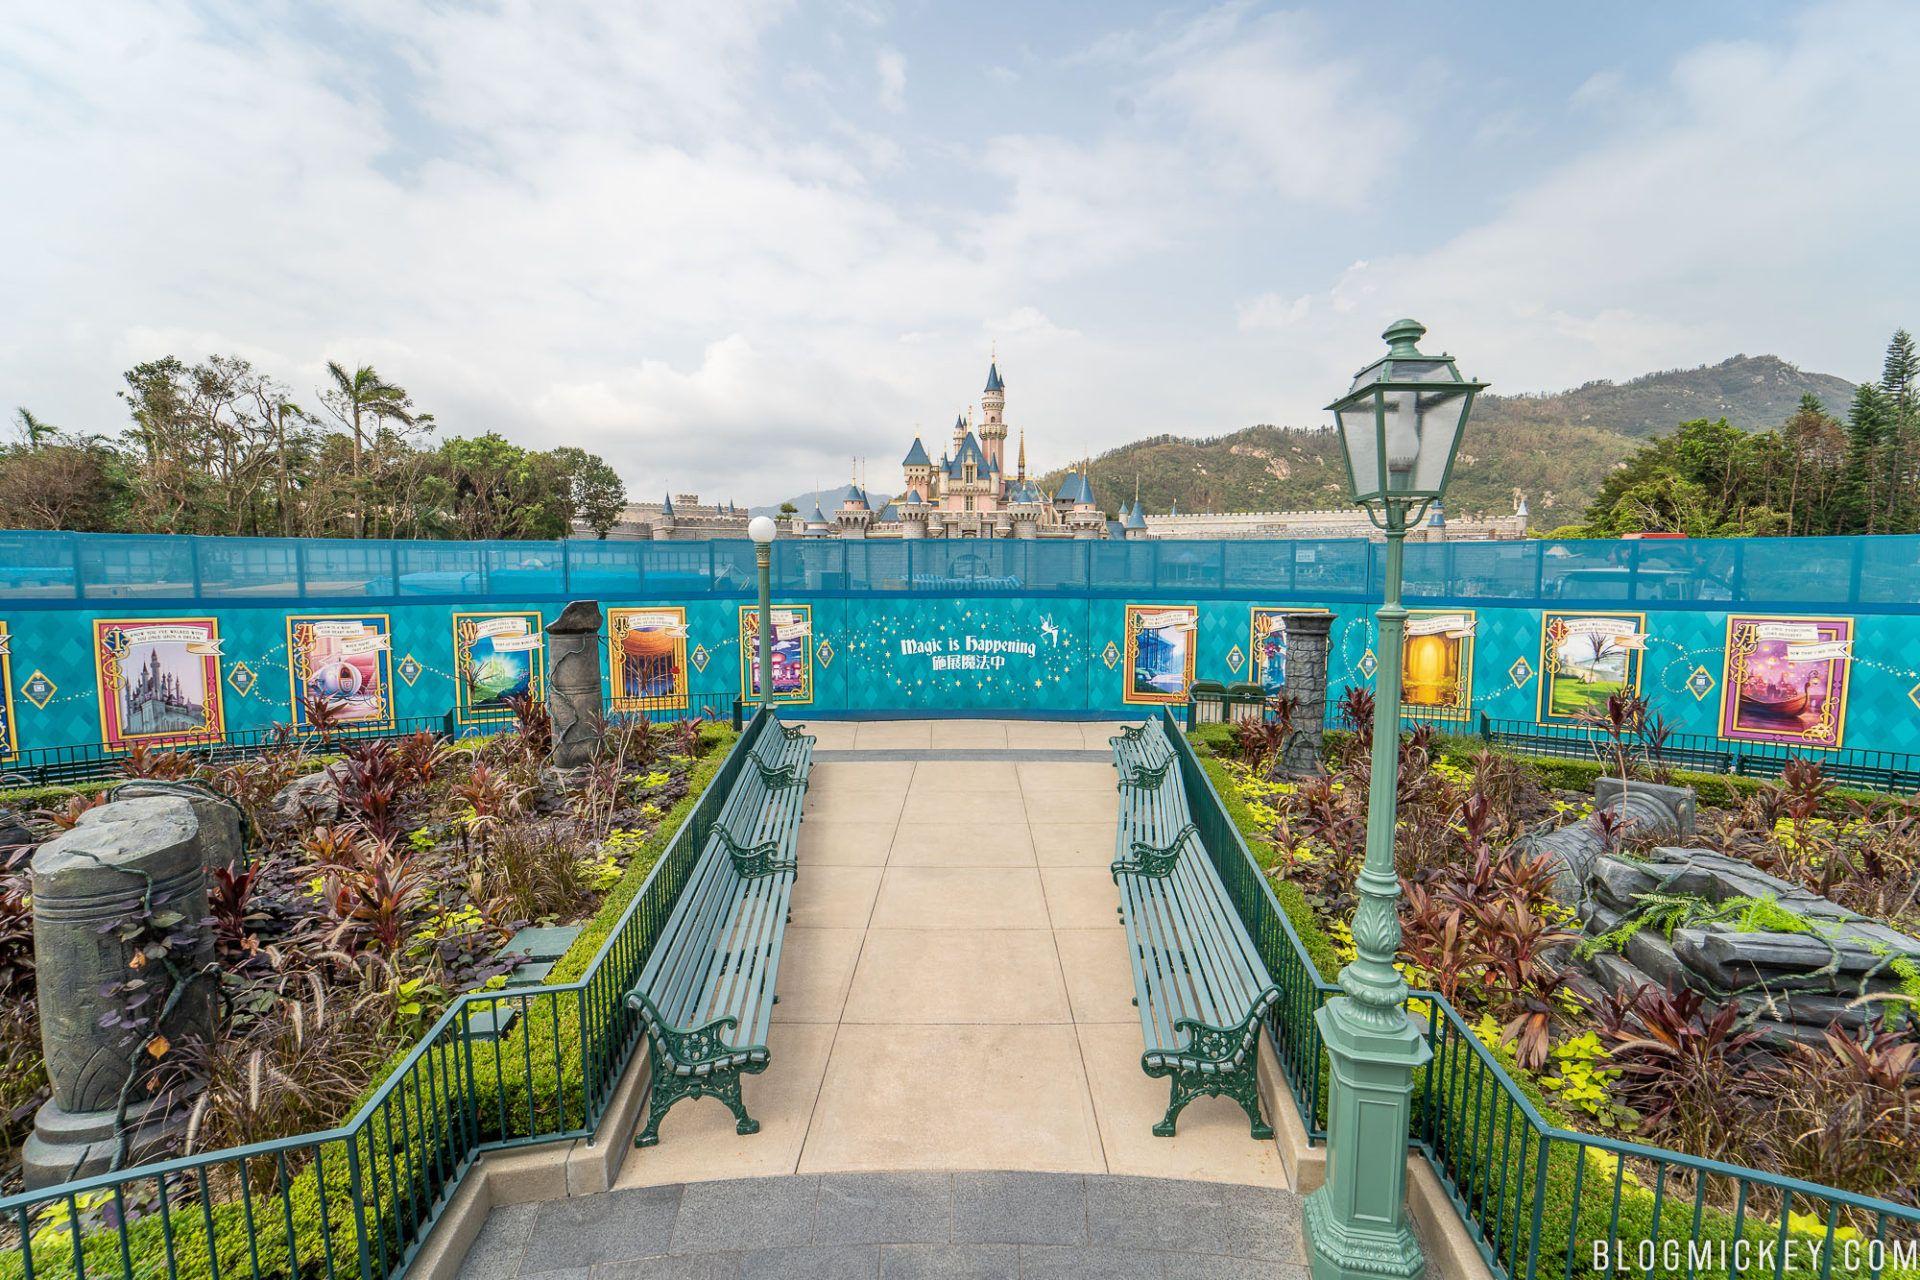 sleeping-beauty-castle-transformation-hong-kong-disneyland-09272019-2